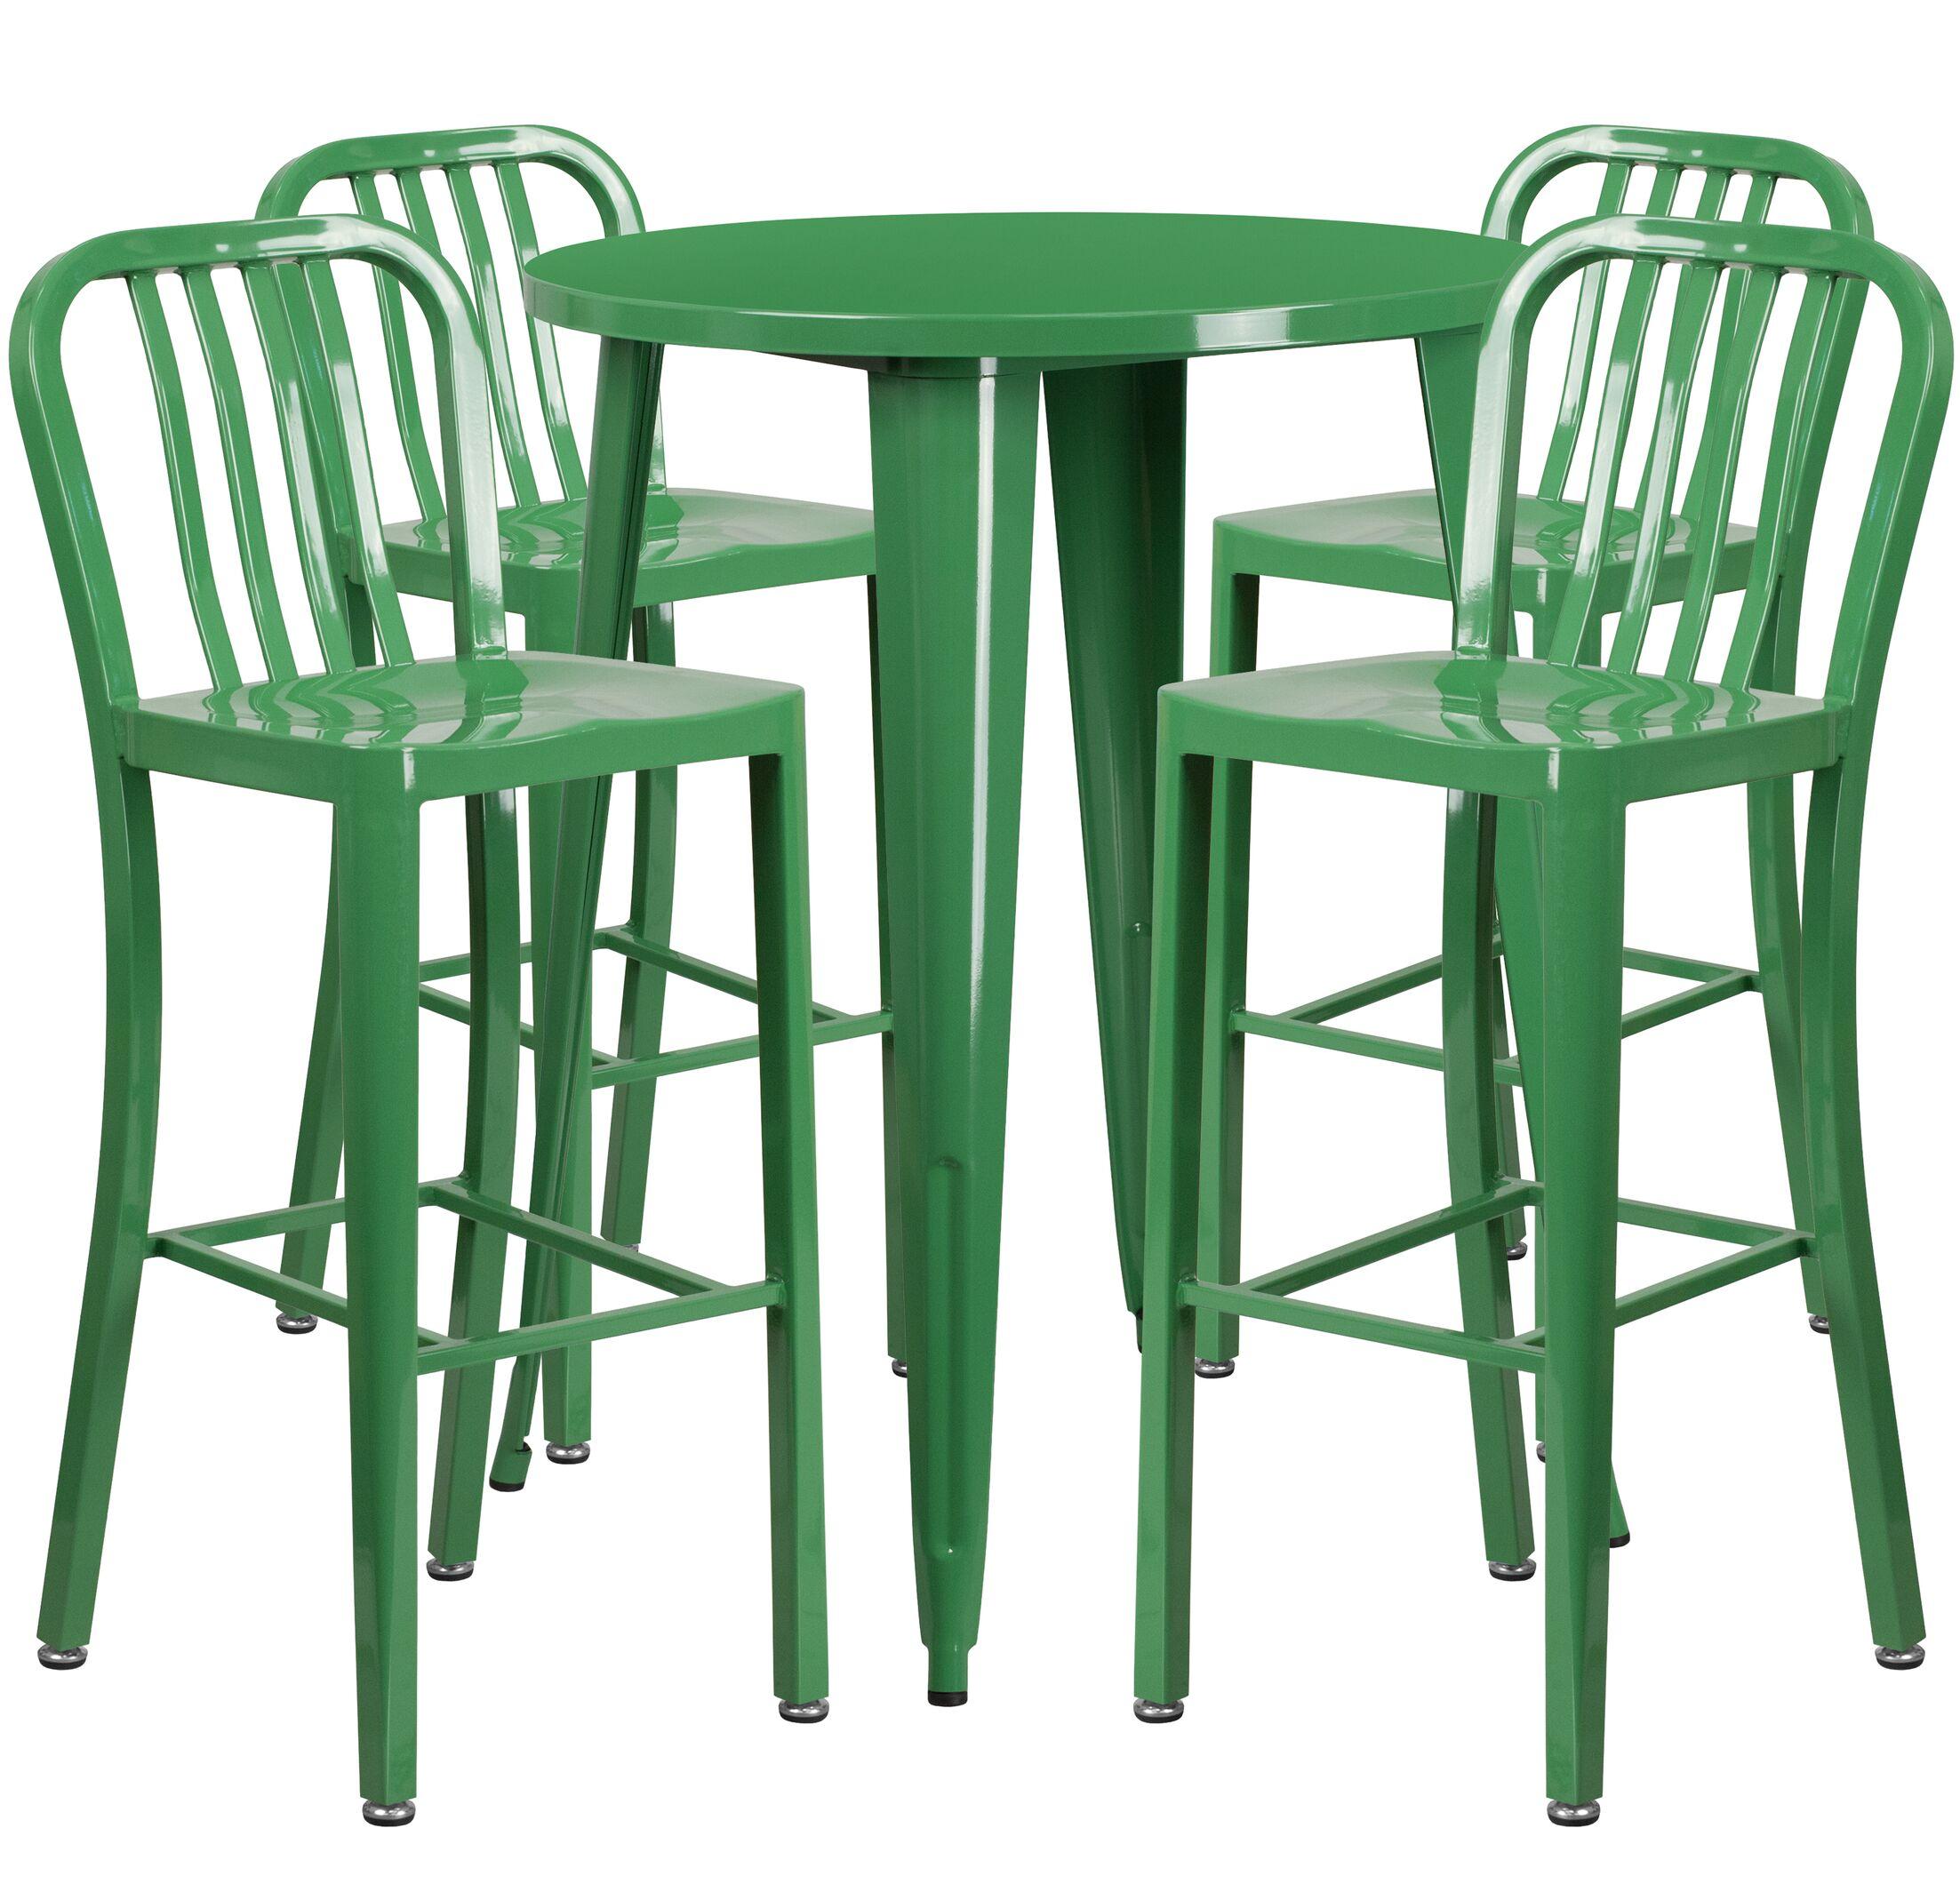 Posey 5 Piece Bar Height Dining Set Finish: Green